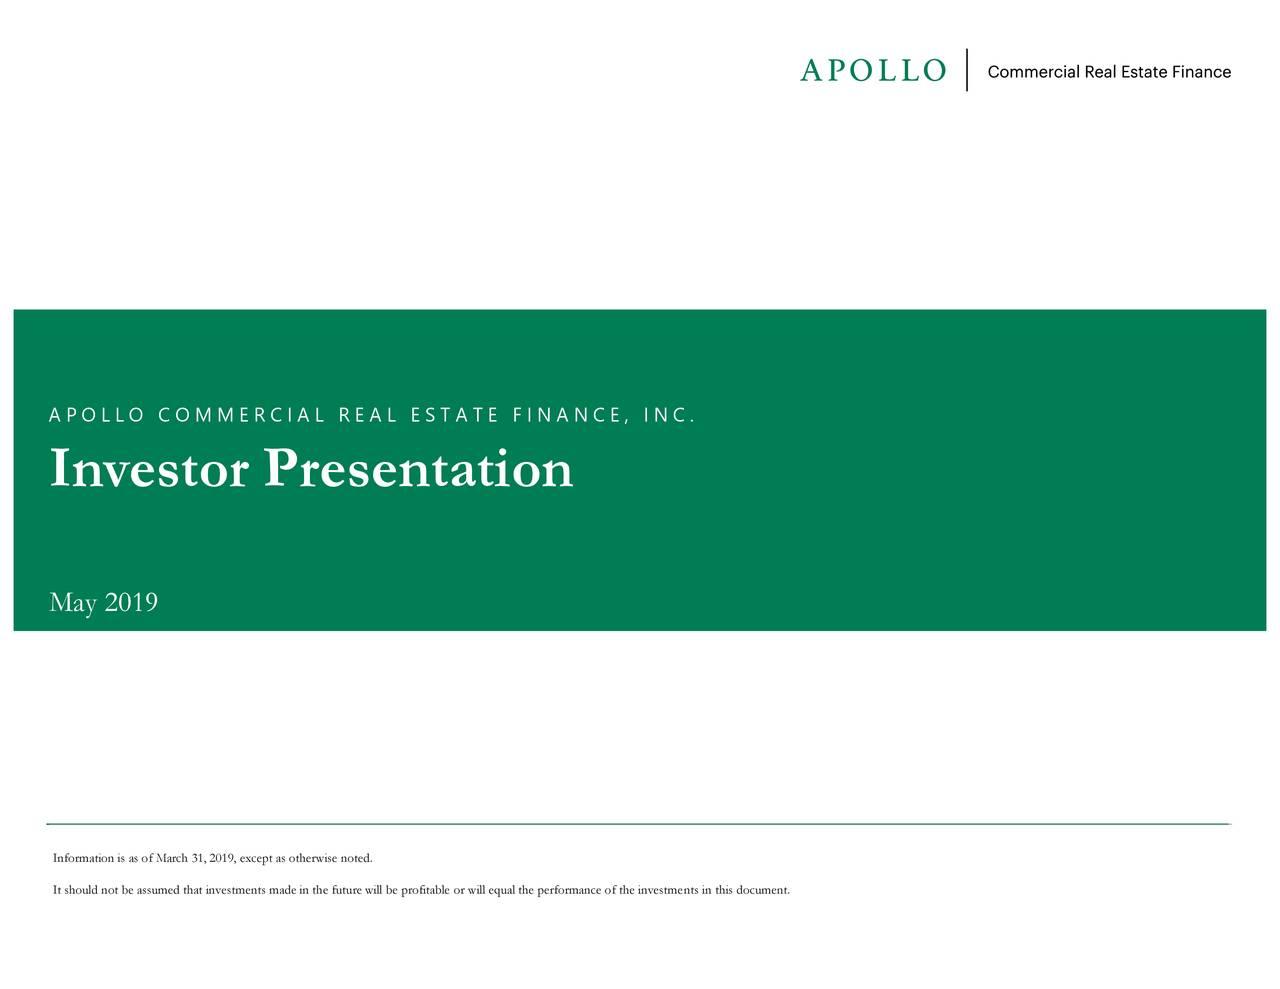 Apollo Commercial Real Estate Finance (ARI) Investor Presentation - Slideshow